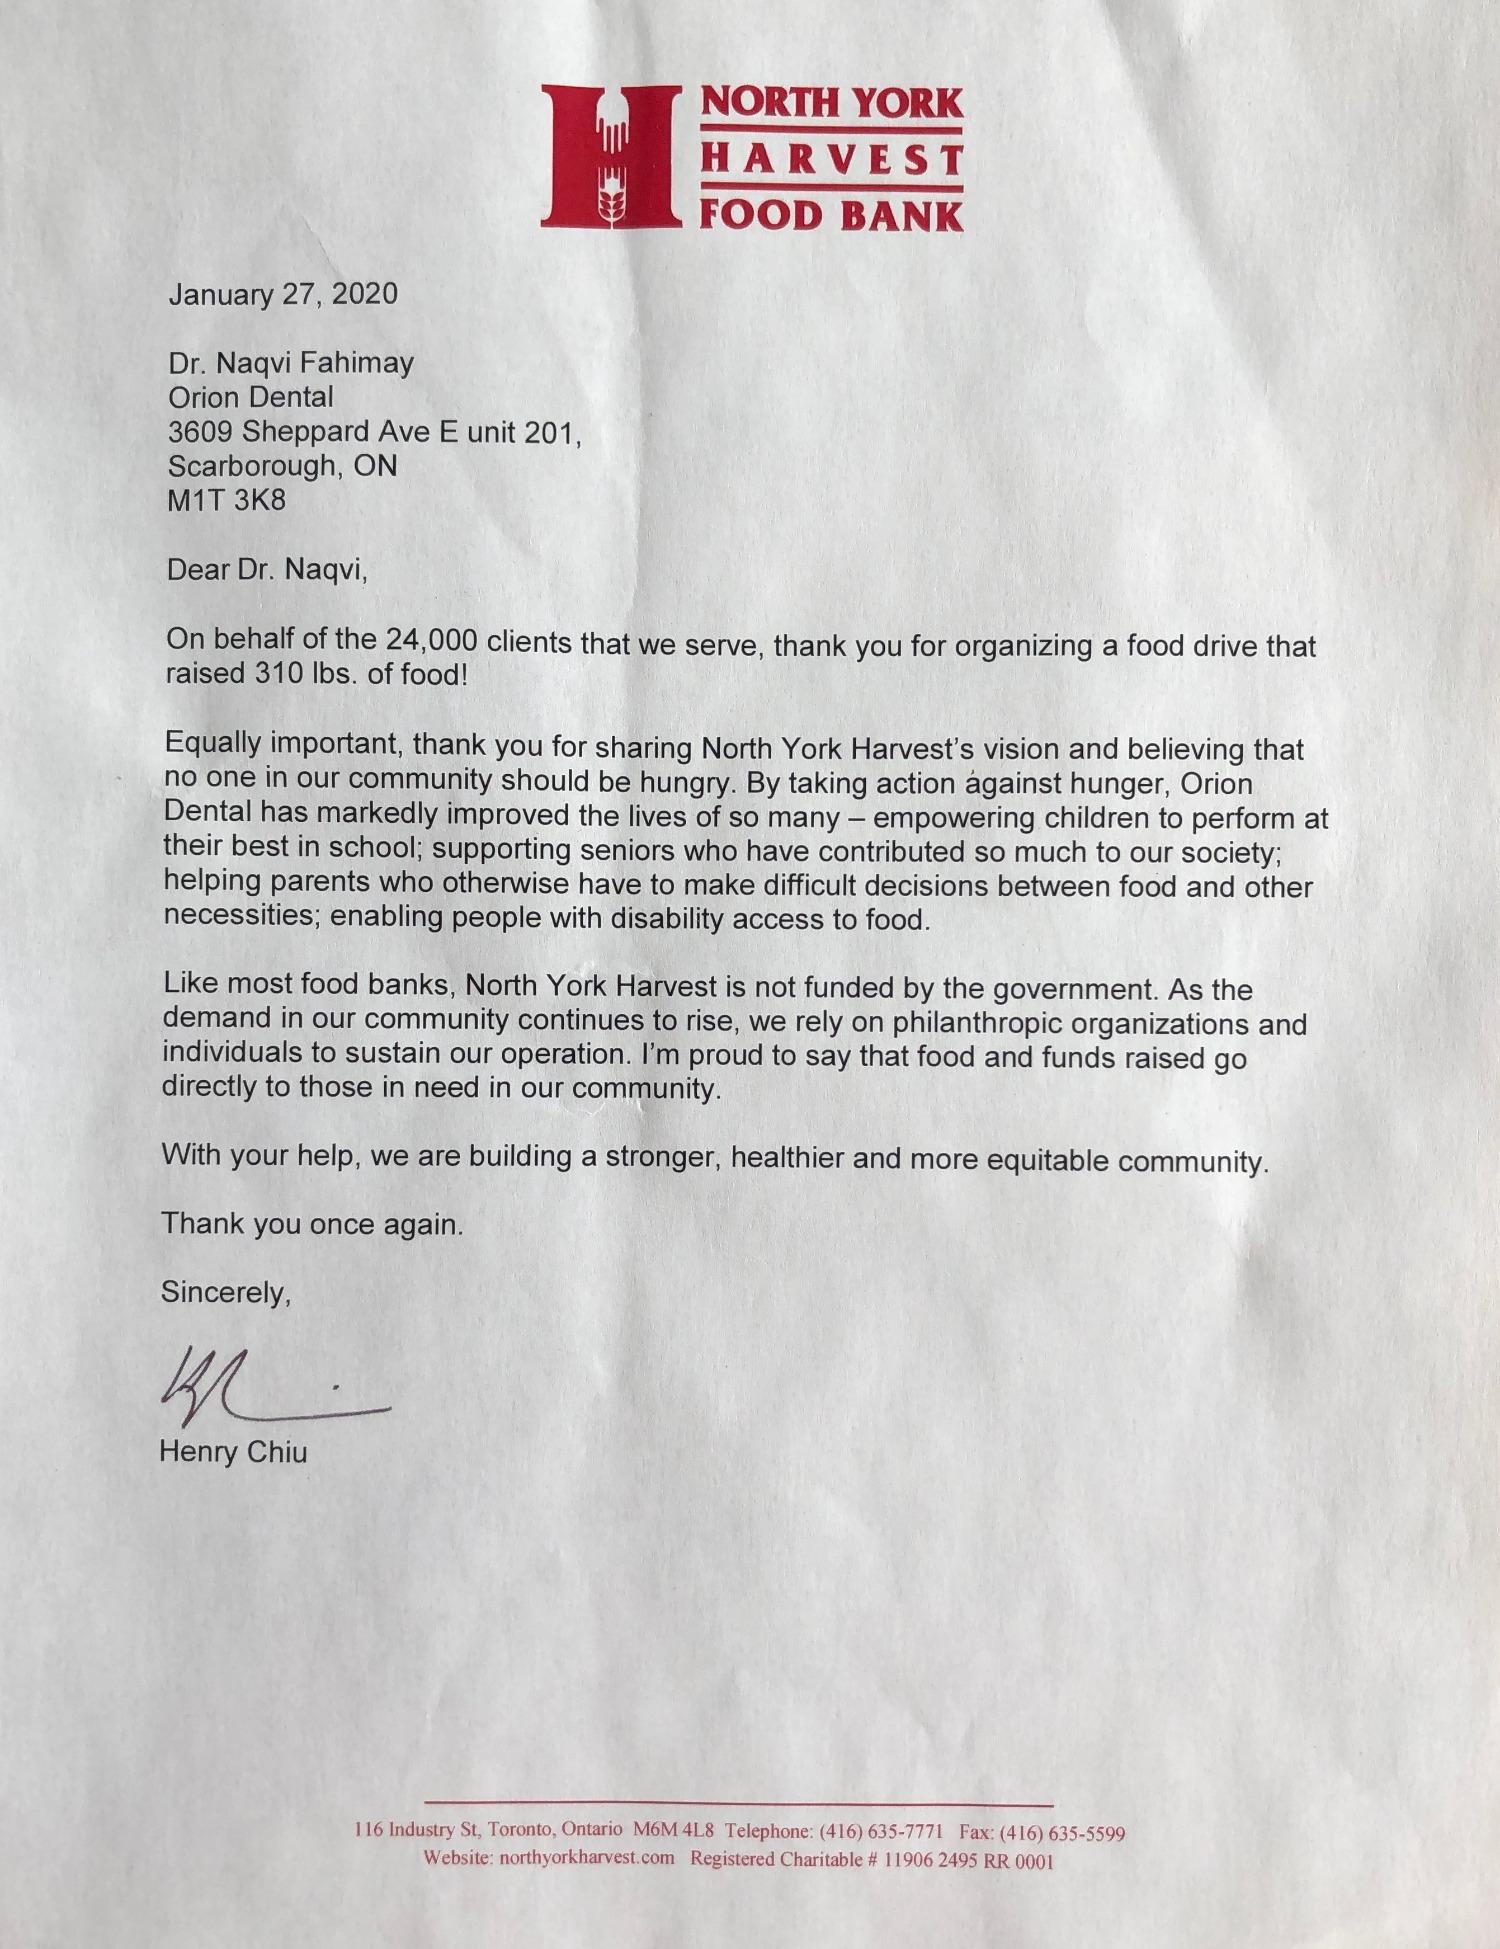 North York Food Bank Letter to Orion Dental 2019